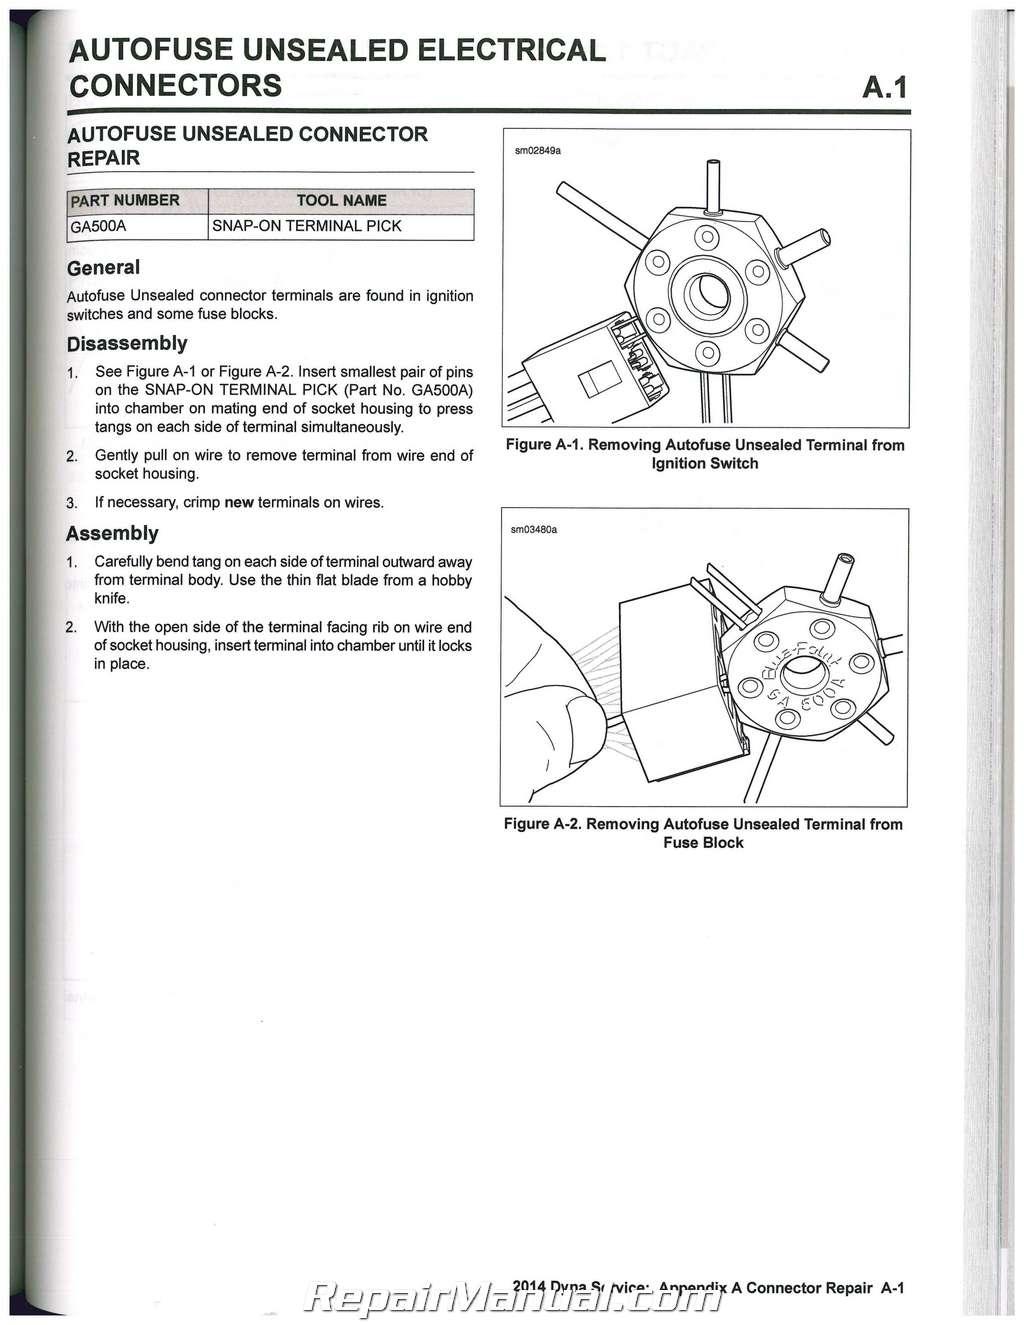 2014 harley davidson service manual pdf